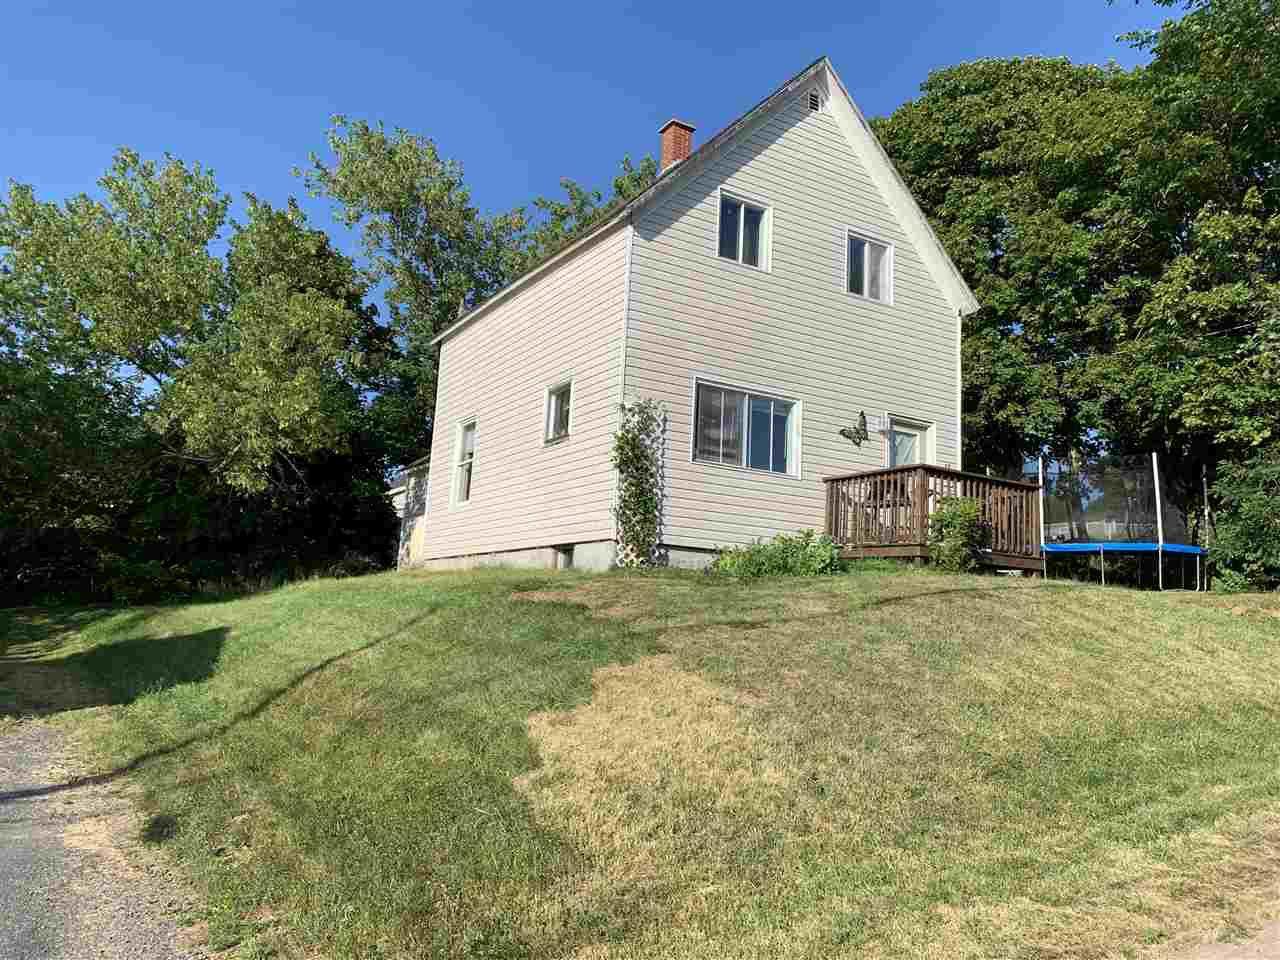 Main Photo: 37 Hampson Street in Trenton: 107-Trenton,Westville,Pictou Residential for sale (Northern Region)  : MLS®# 202016262